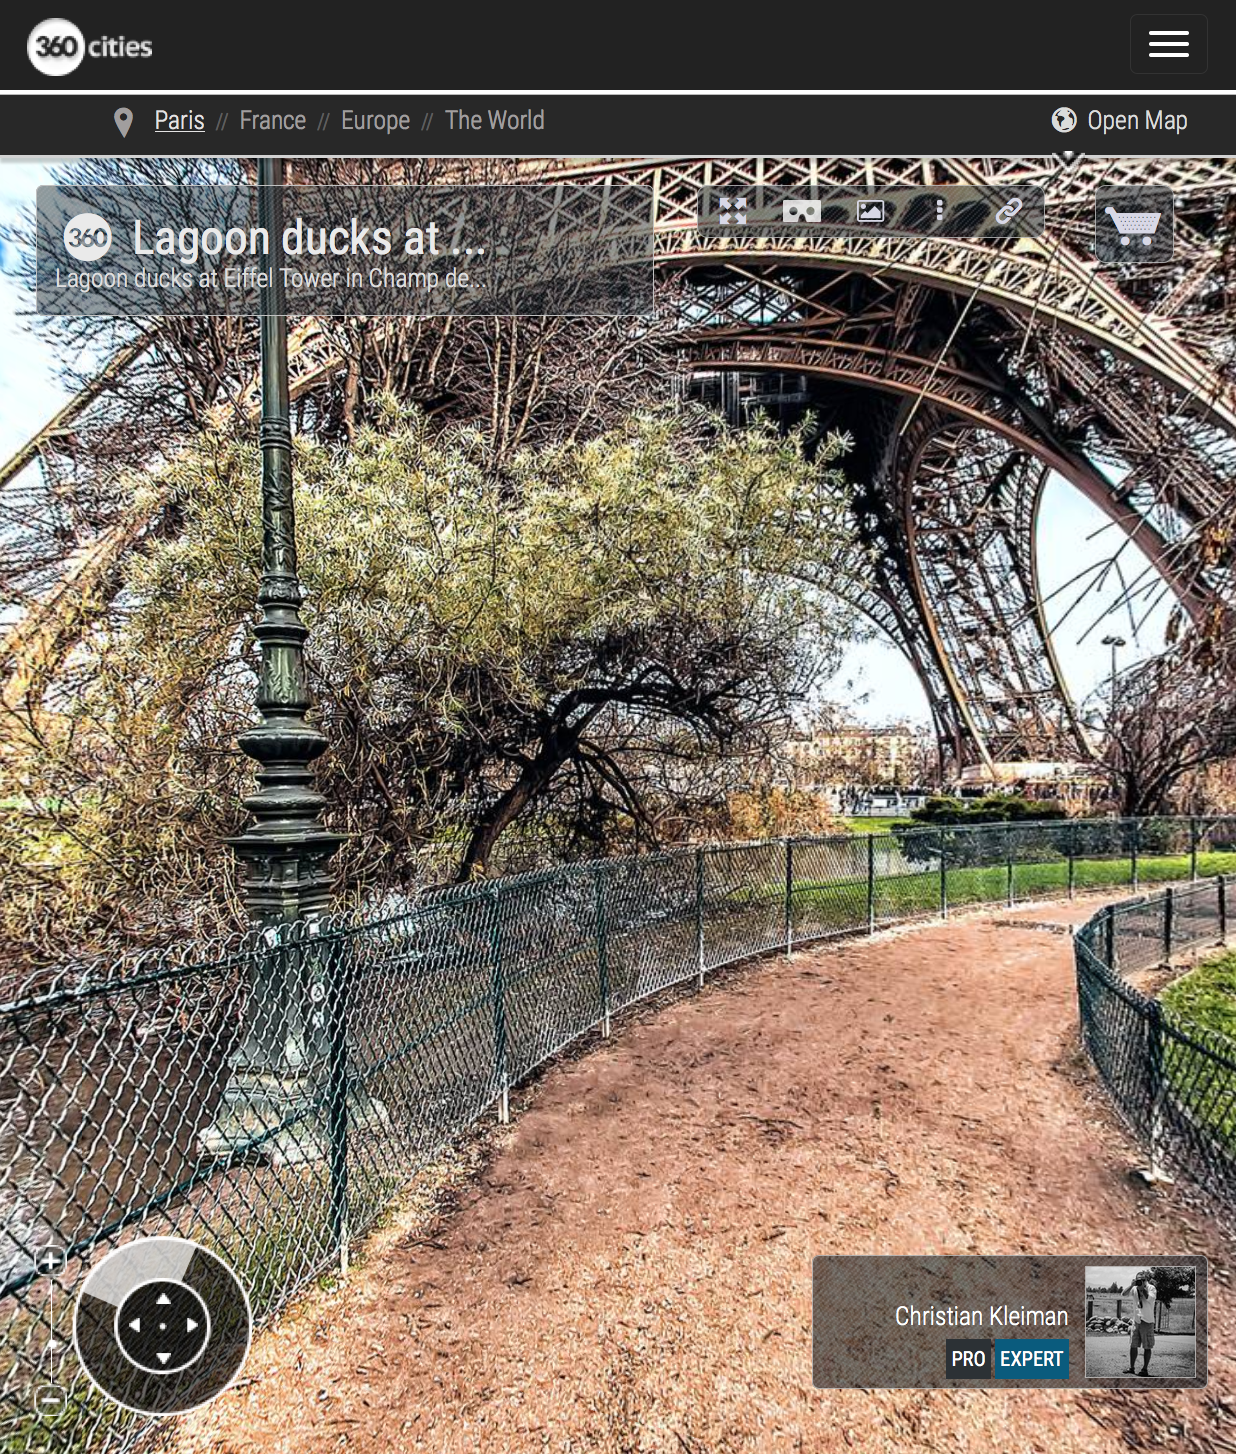 Lagoon ducks - Eiffel Tower - Winter at Champ de Mars Garden - Creative 360 VR Spherical Panoramic Photography - Emblematic Paris by © Christian Kleiman